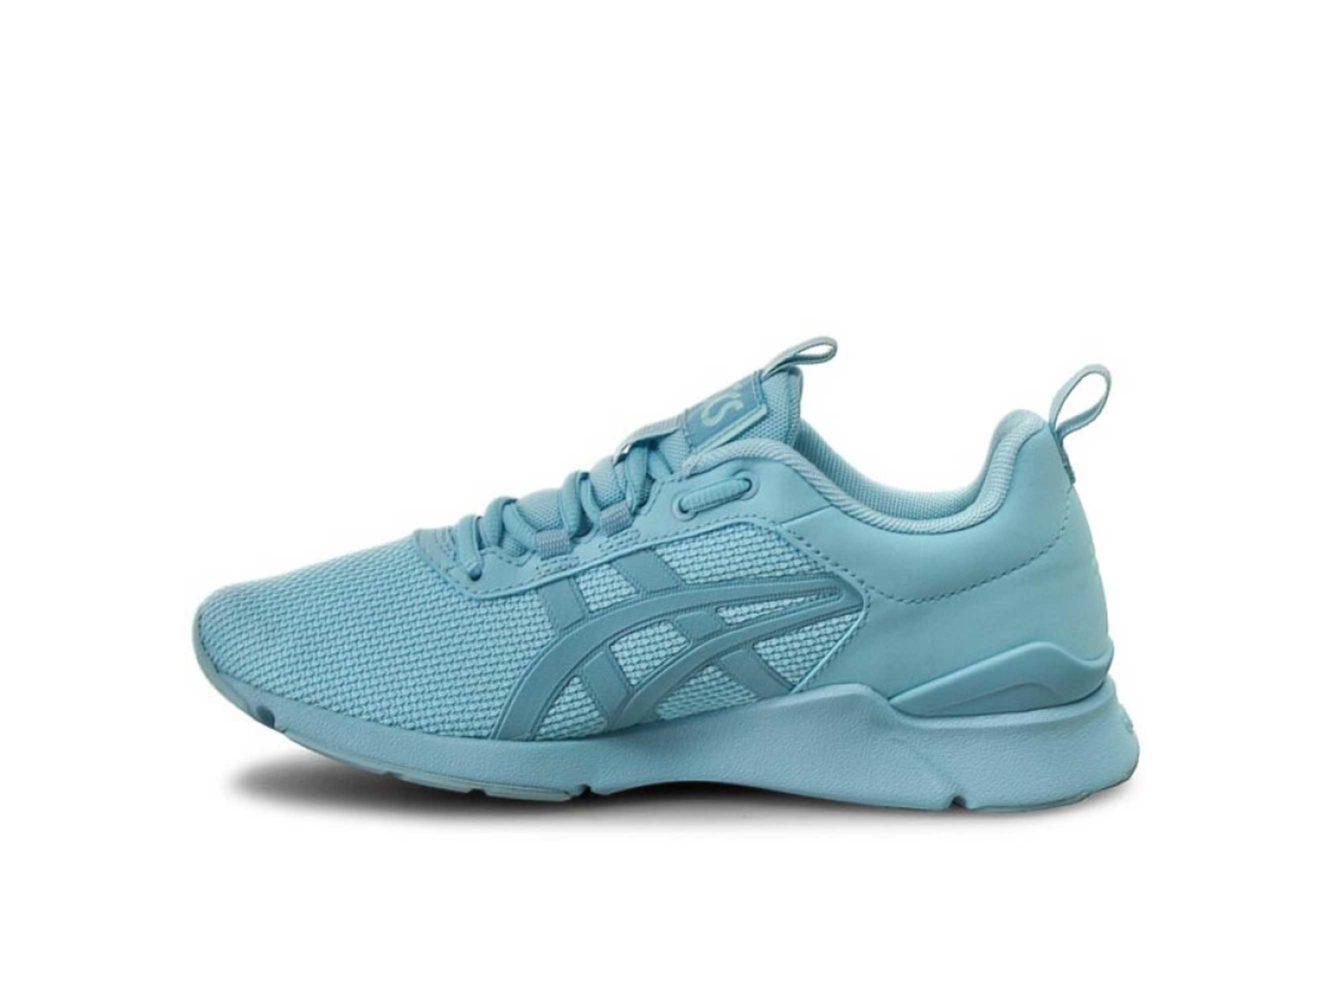 asics gel-lyte runner crystal blue hn6e9 купить